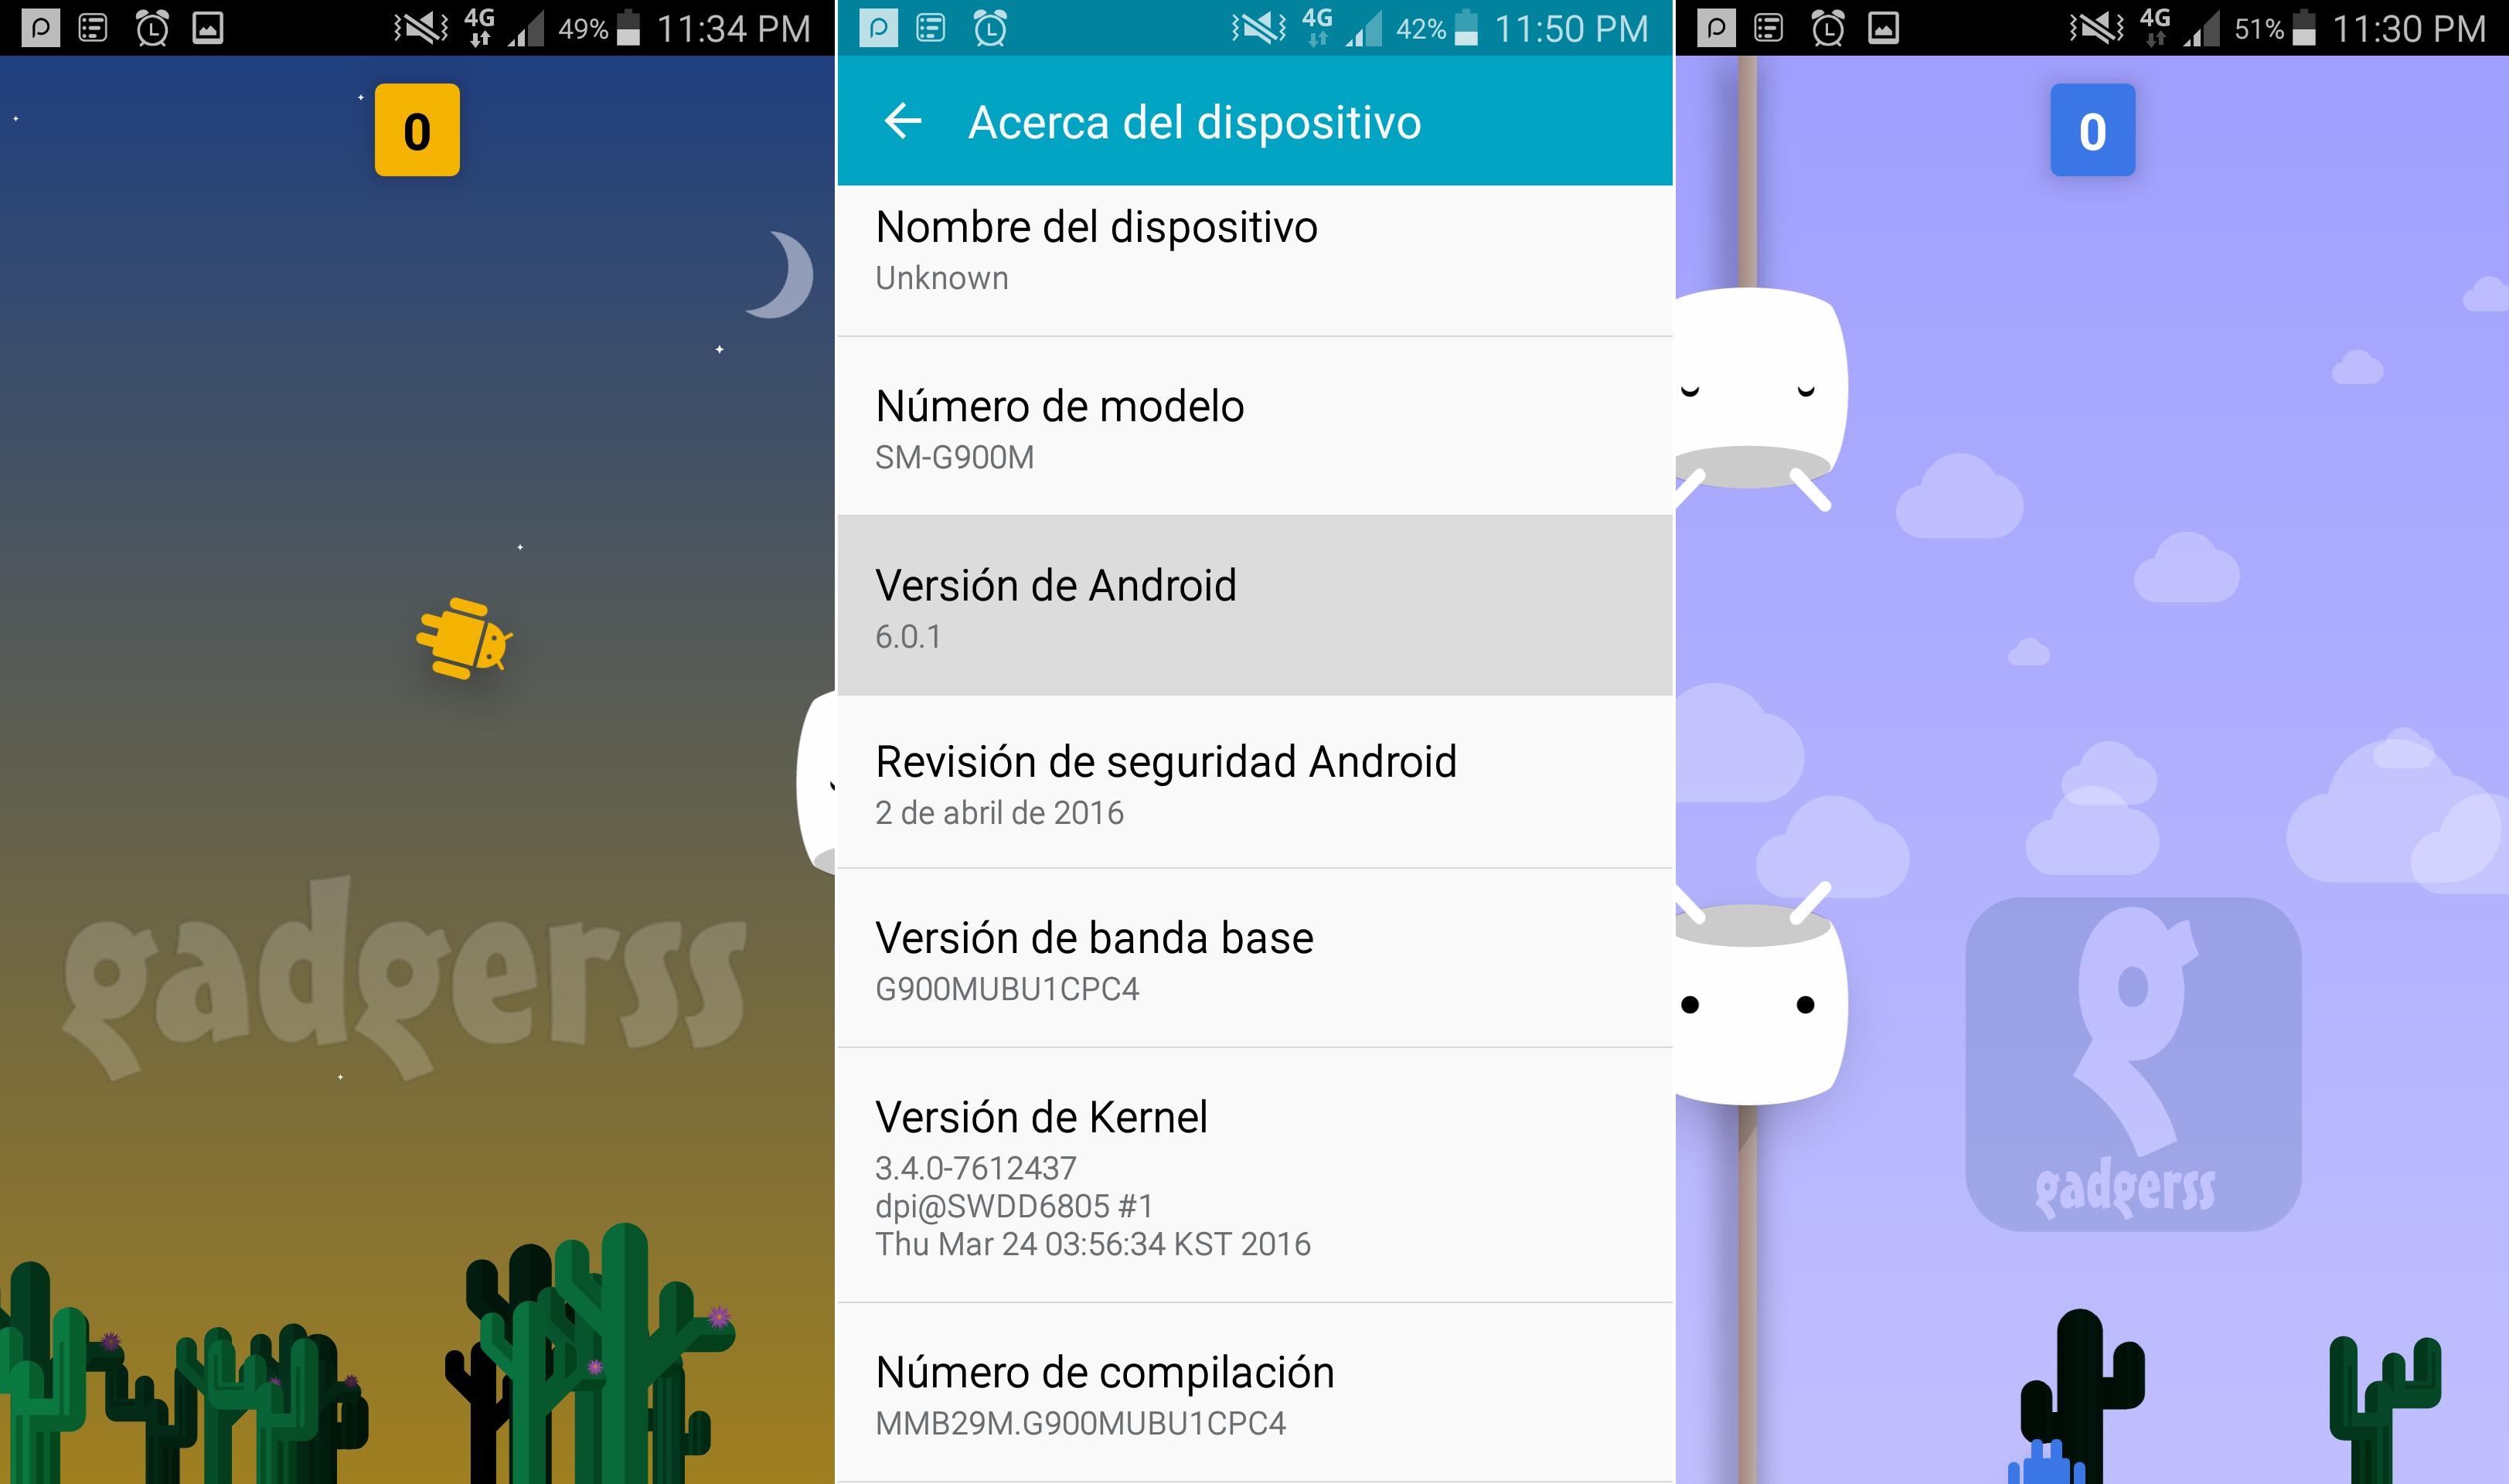 descargar android 6.0 para samsung s5 g900m